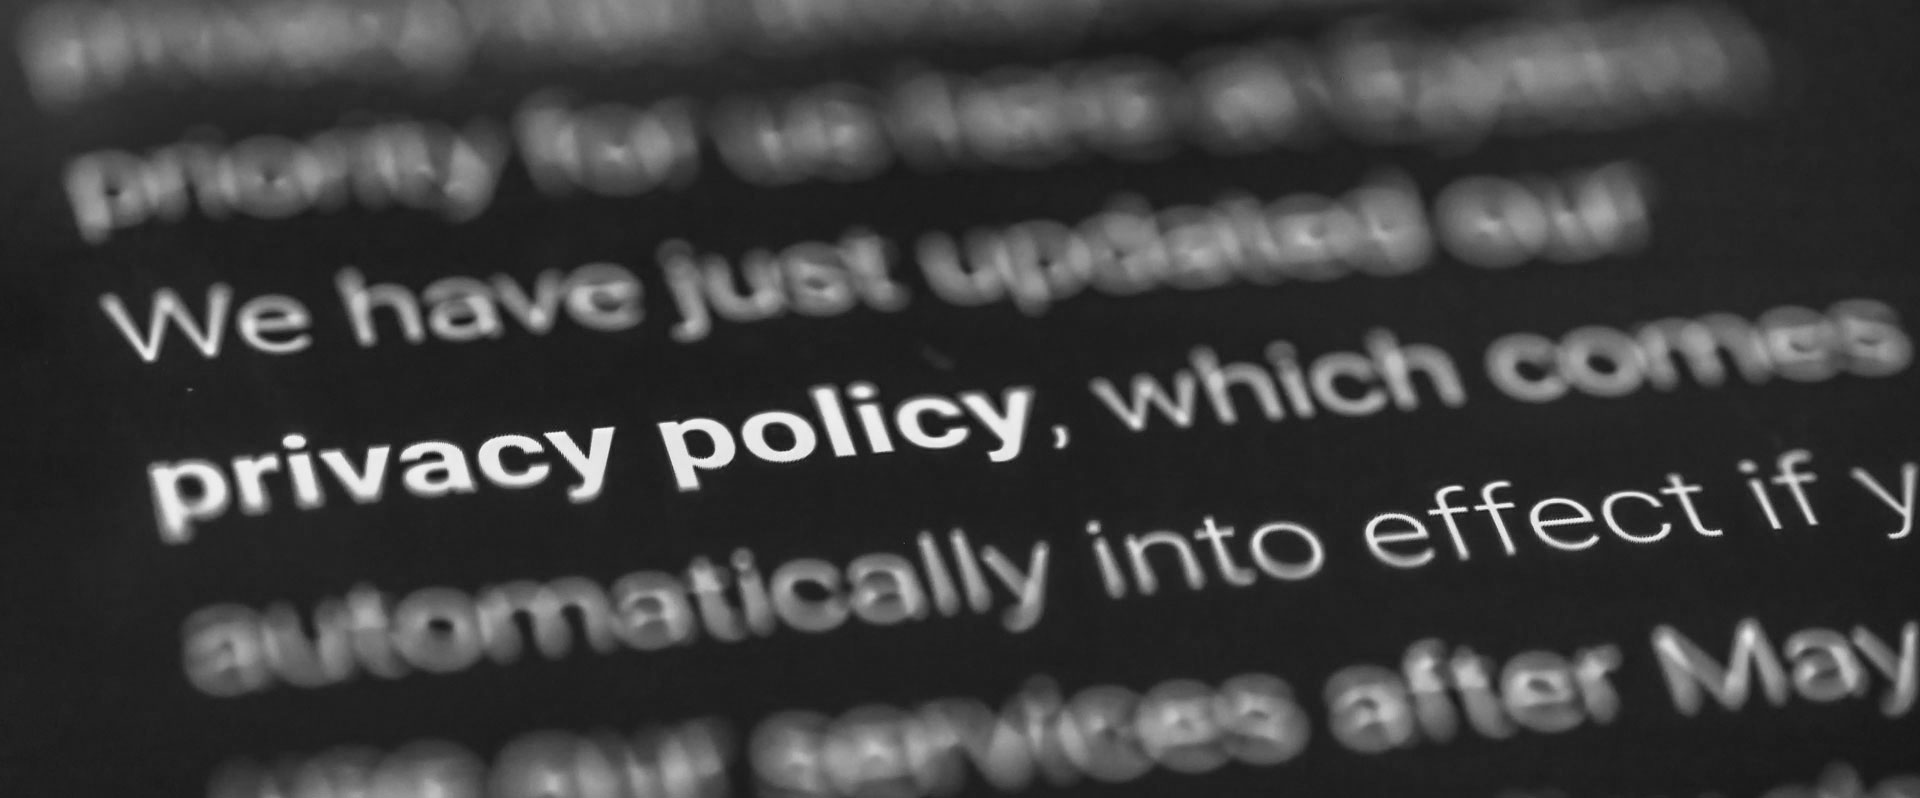 privacypolicy__.jpg